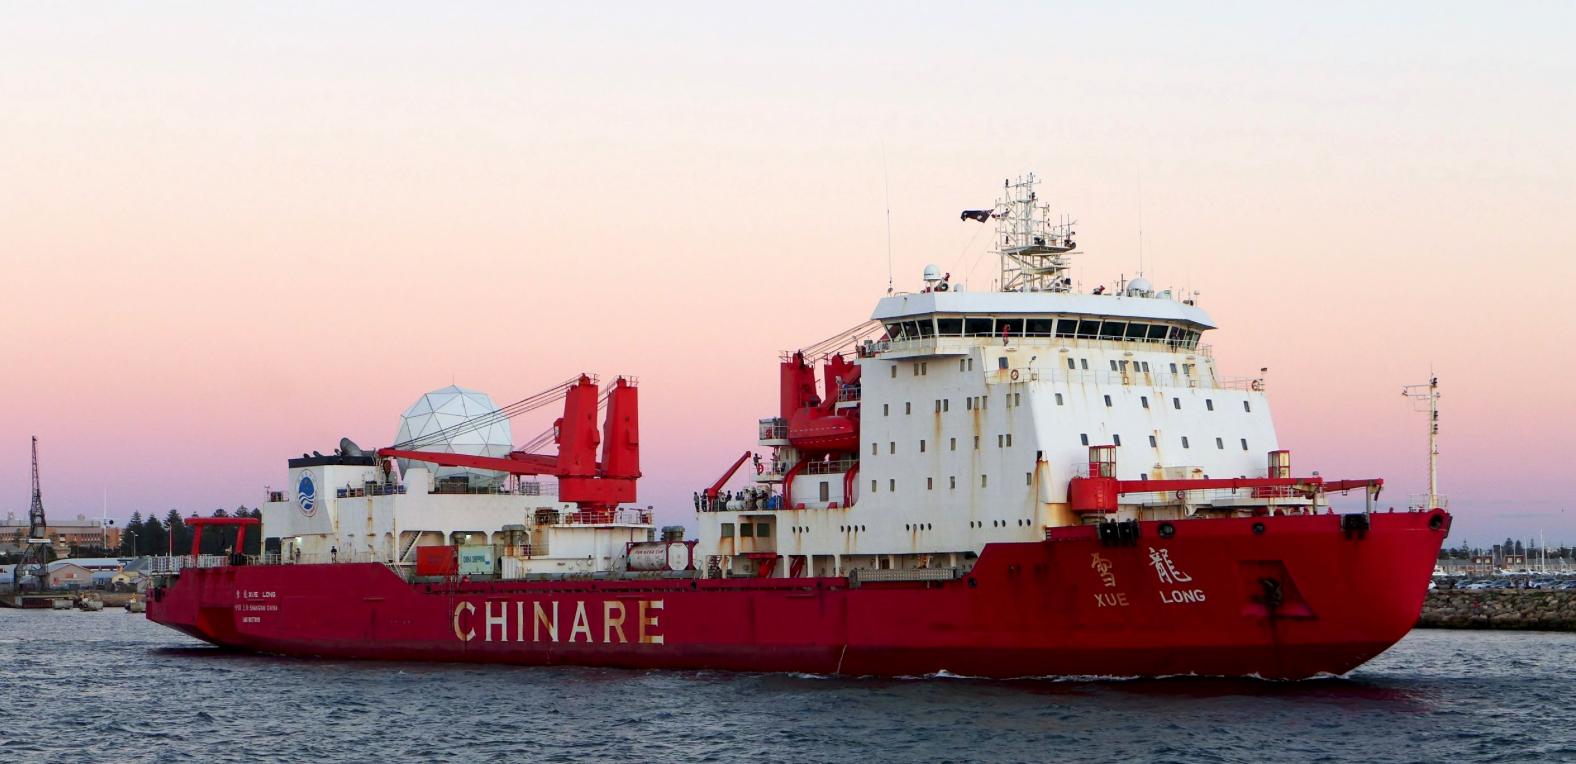 Polar Politics: How the South China Sea Illuminates China's Role in the Arctic